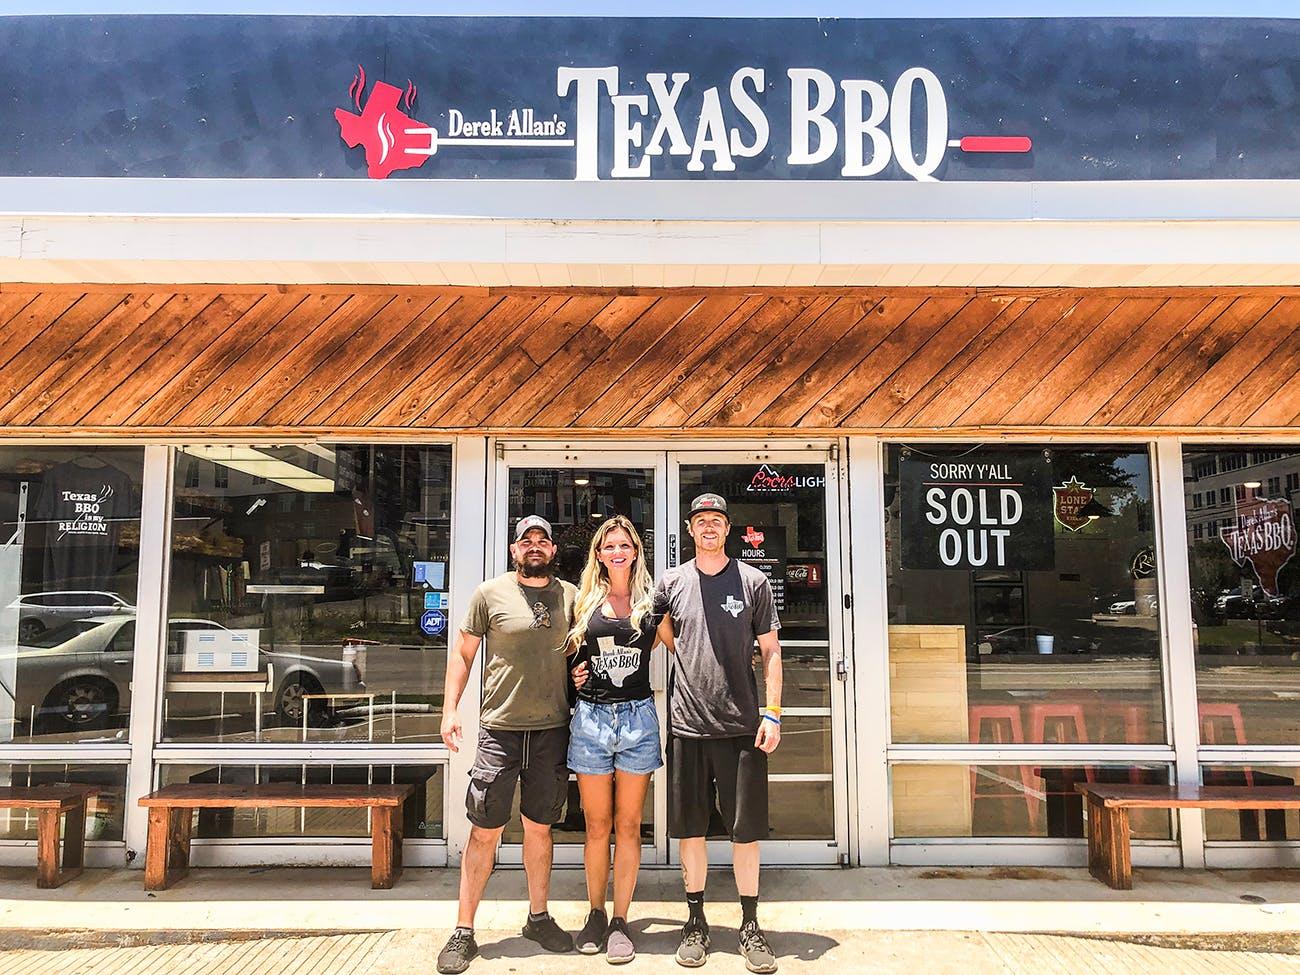 Derek Allan's Texas BBQ restaurant exterior